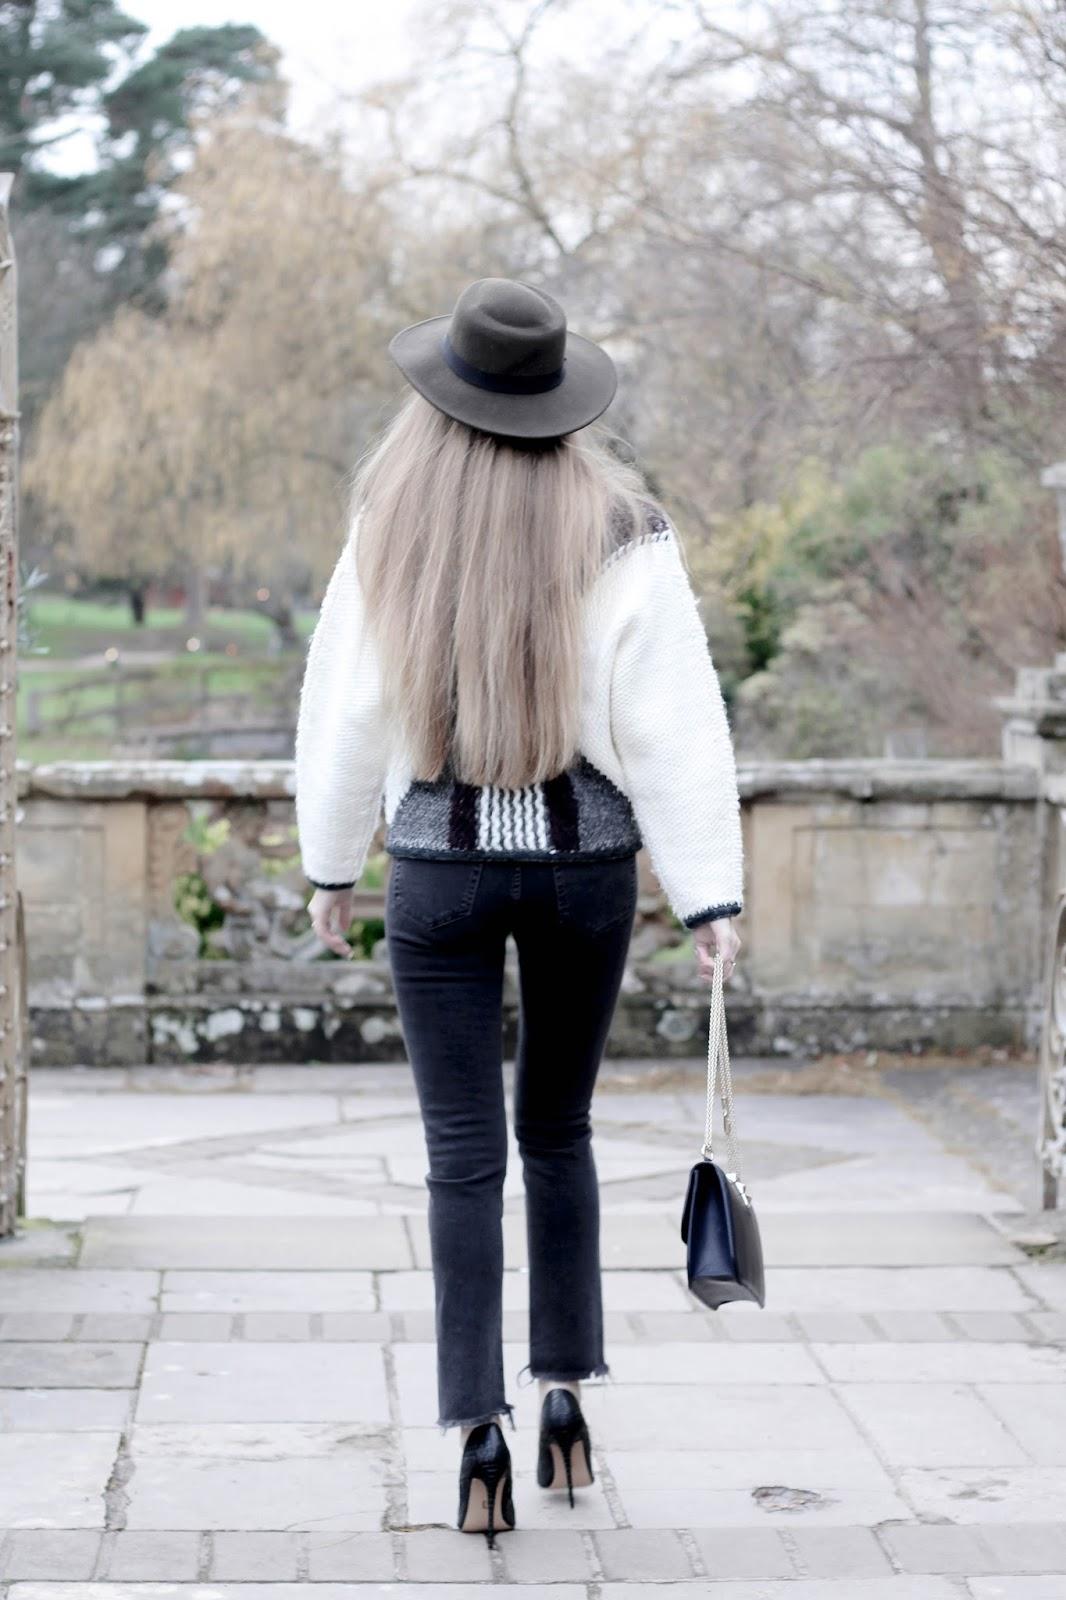 UK very long hair fashion blogger winter styling high heels